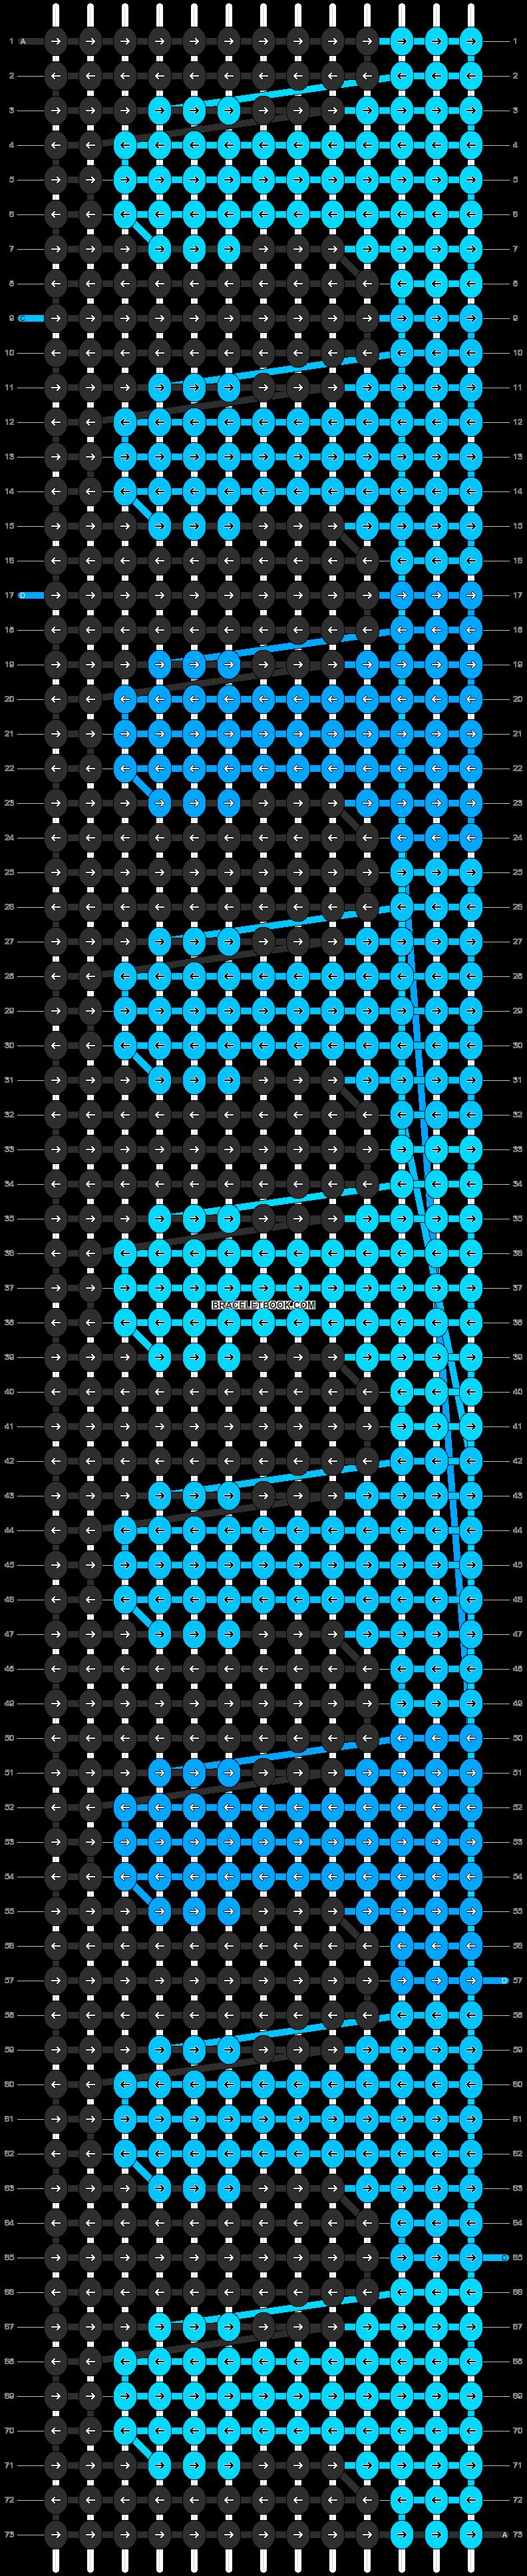 Alpha pattern #11330 pattern